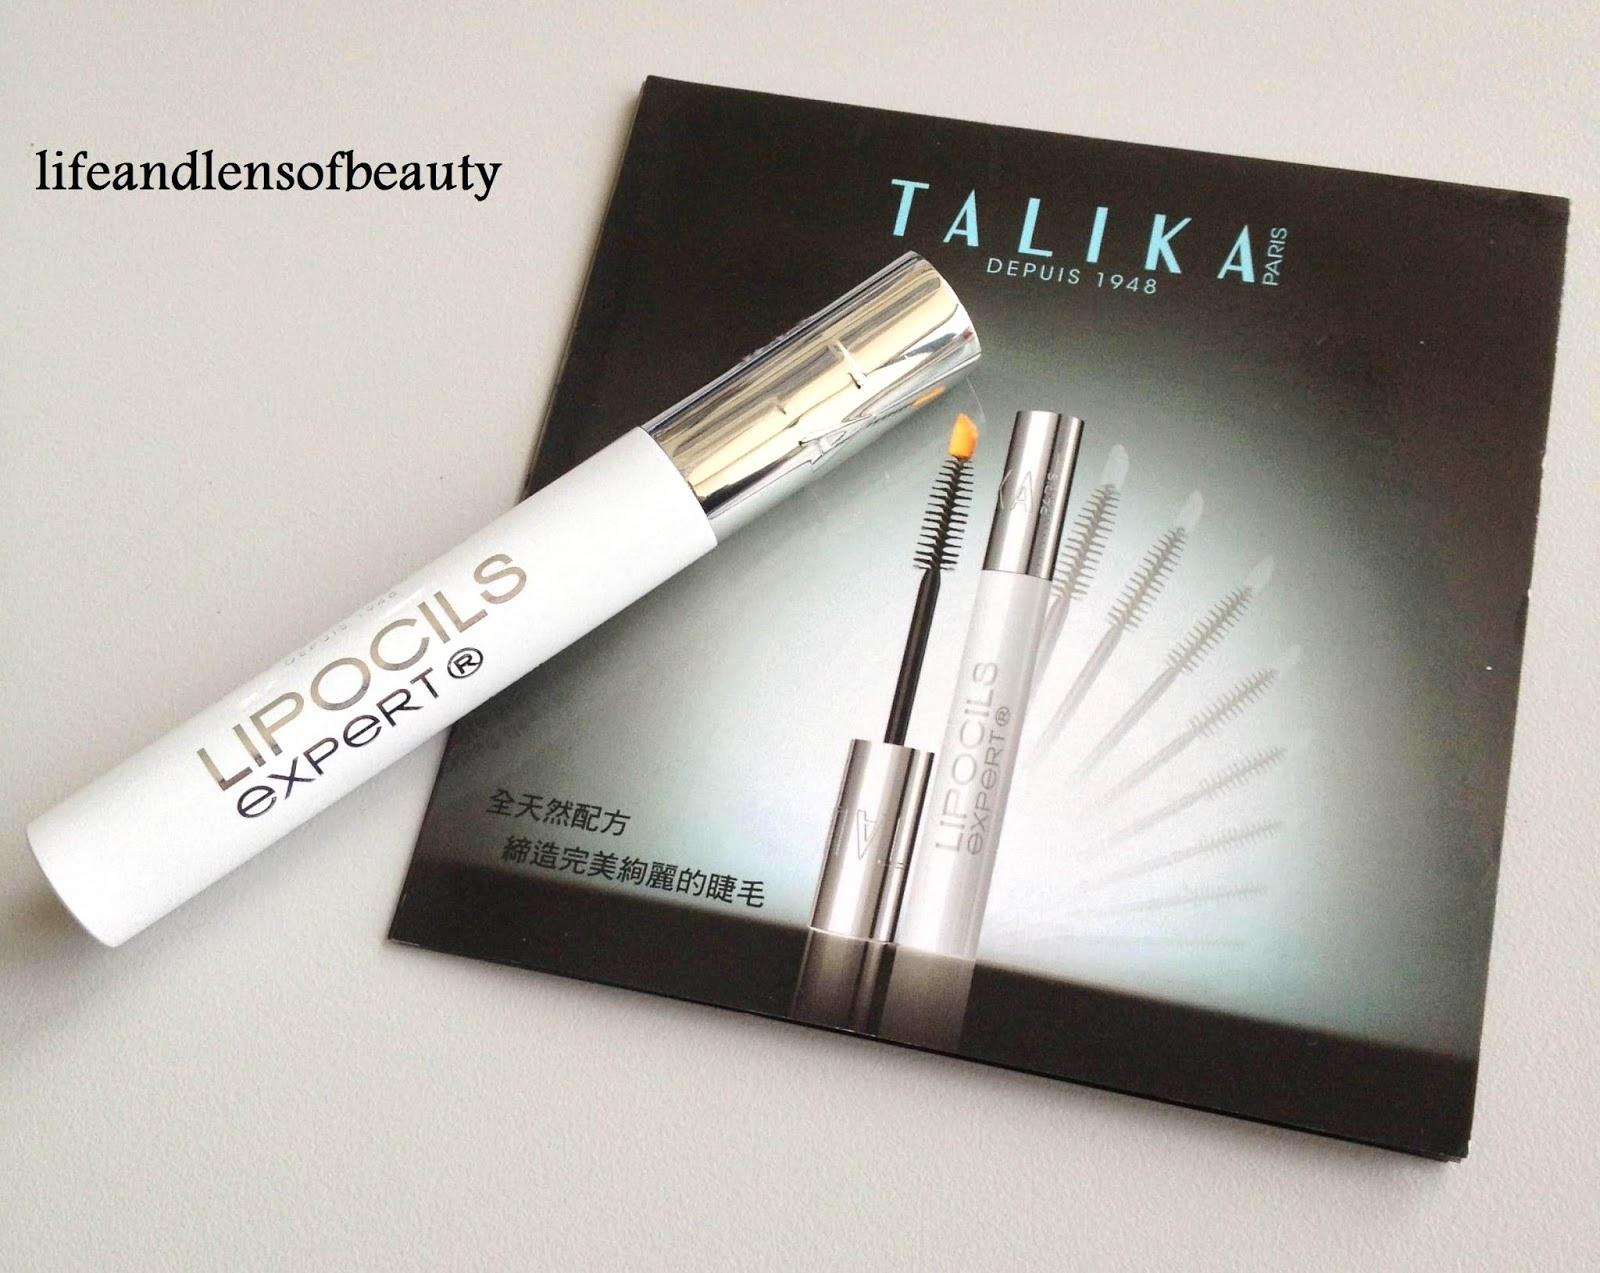 Lifeandlensofbeauty Talika Lipocils Expert Eyelash Conditioning Gel